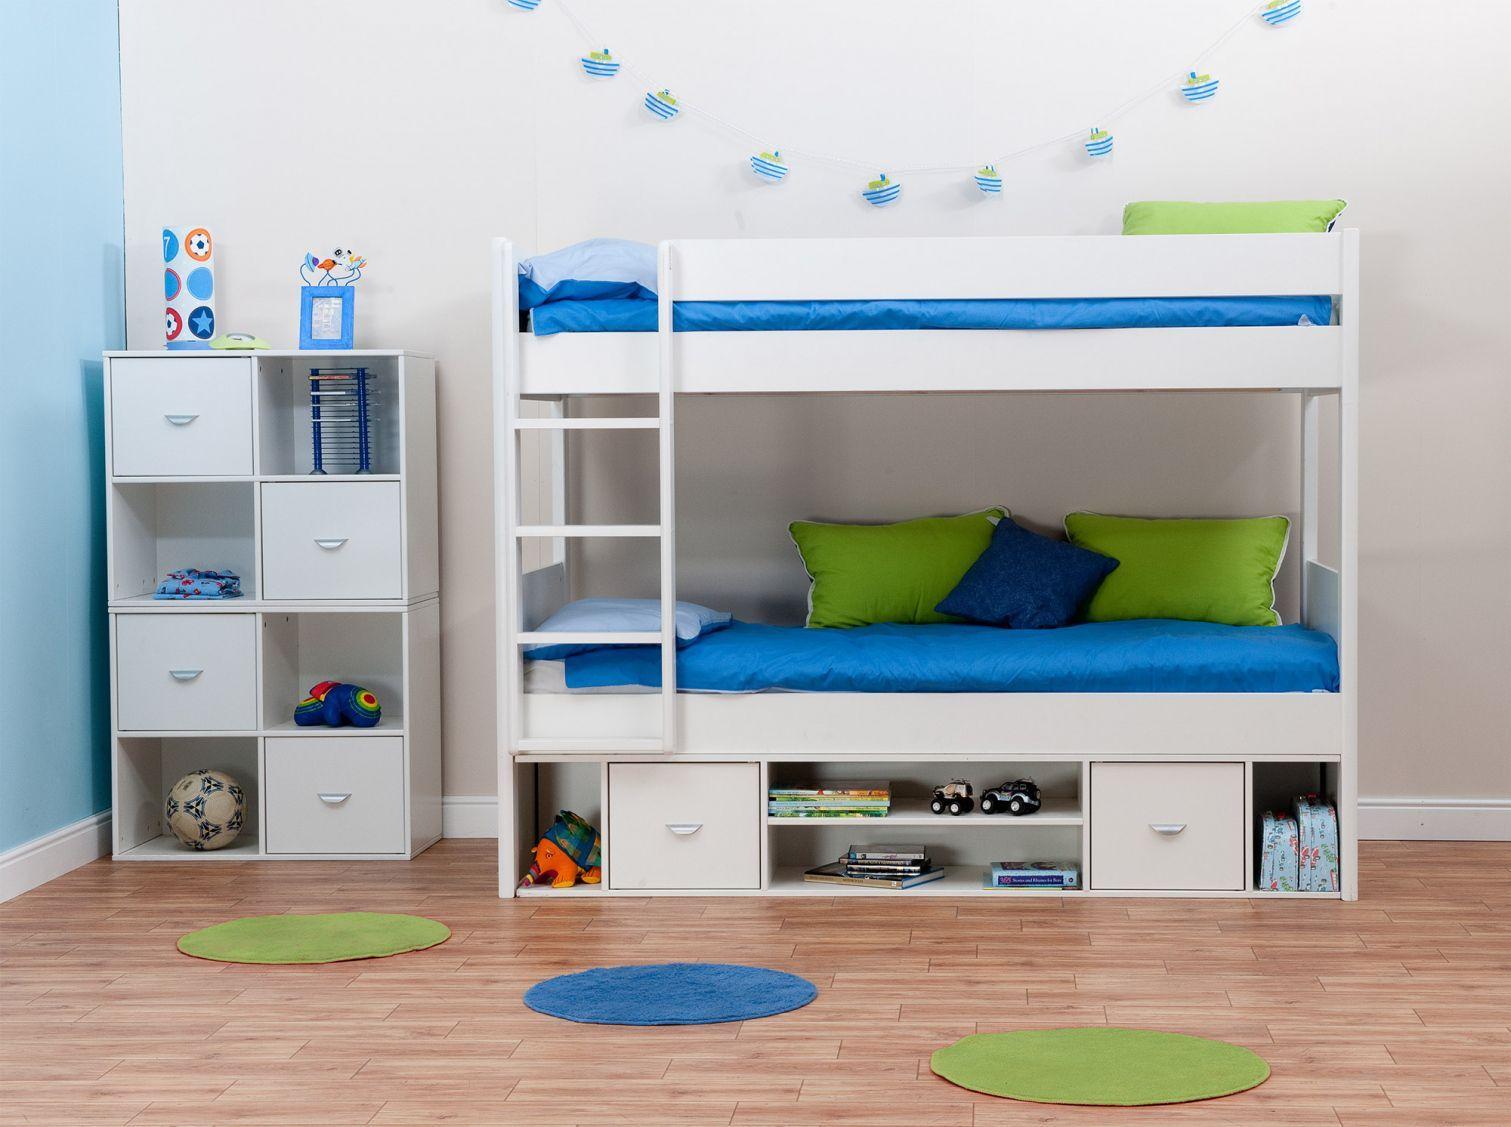 College loft bed ideas   College Dorm Bunk Beds  Interior Design Ideas Bedroom Check more